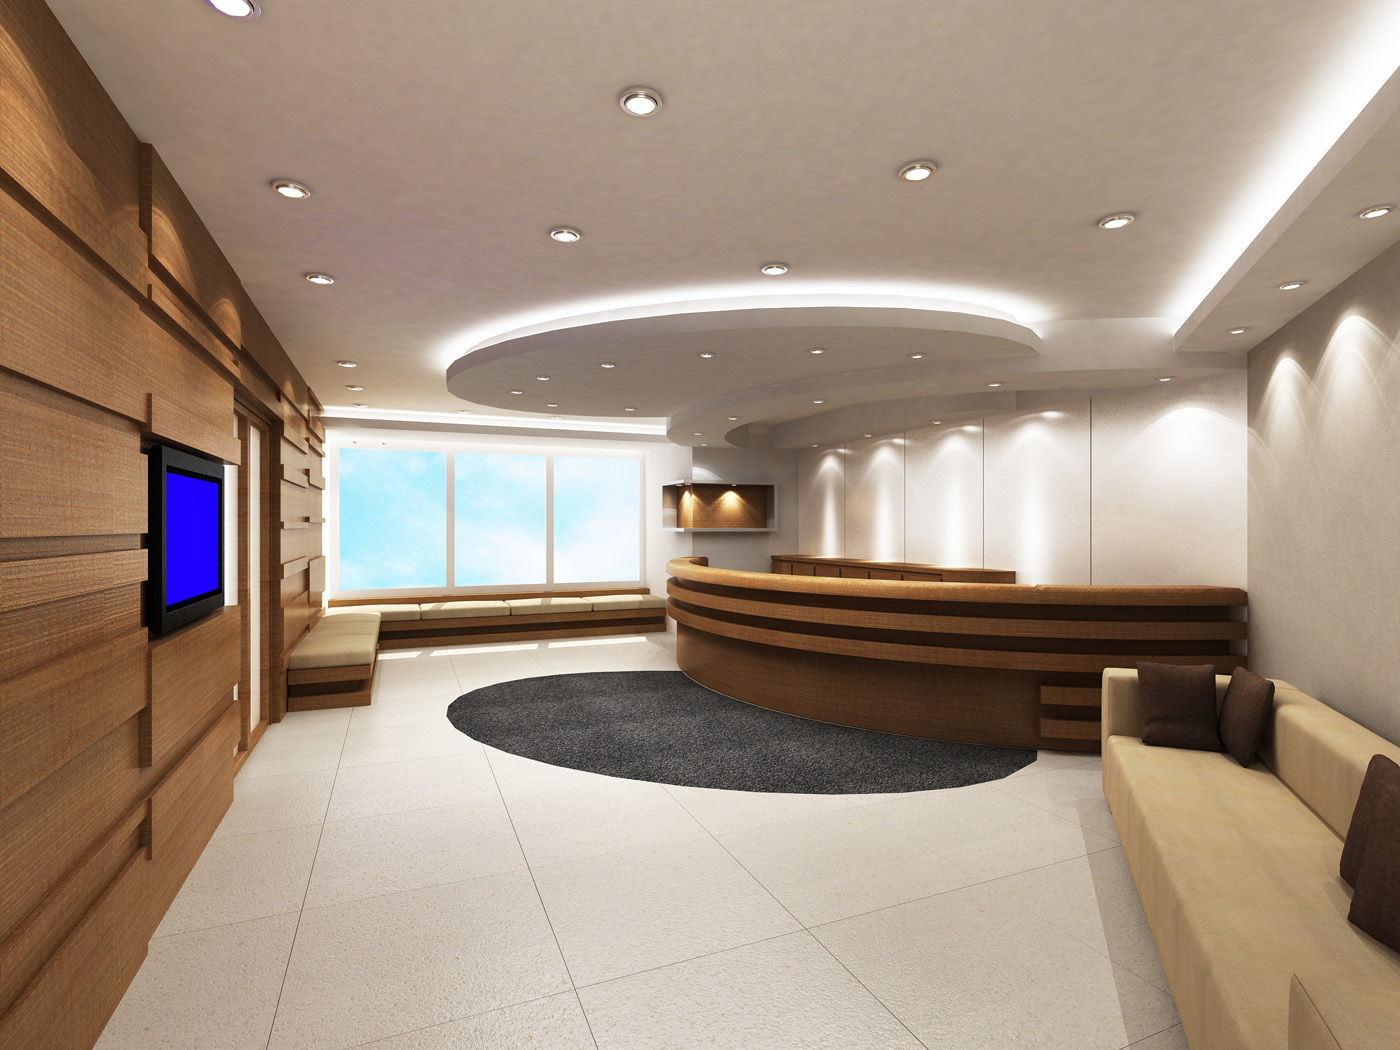 Ges lumination™ led downlights provide customizable lighting design